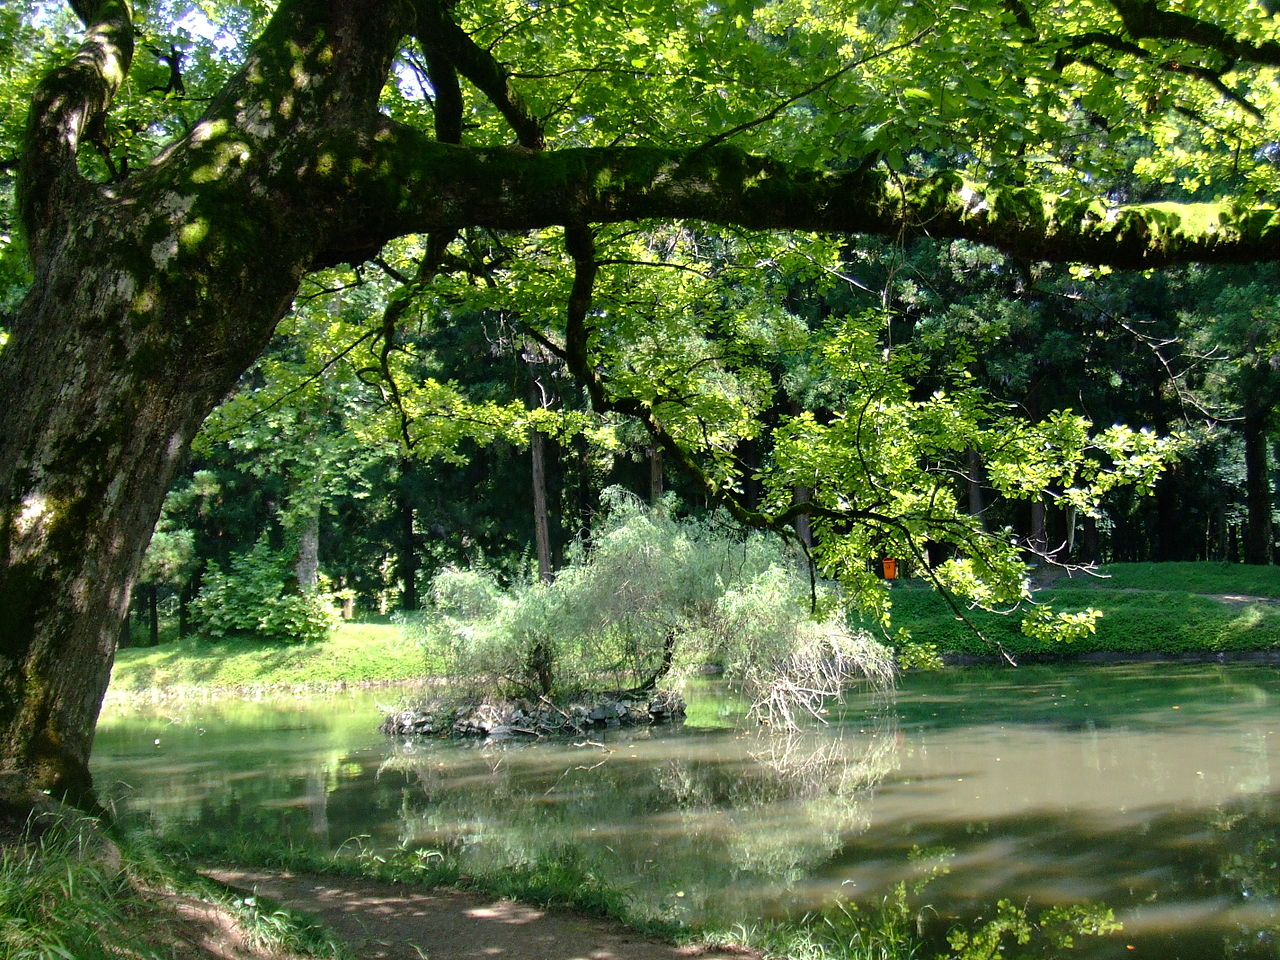 1280px Zugdidi botanical garden5 #новости ботанический сад, Грузия, Дадиани, Дворец Дадиани, Зугдиди, Мегрелия, Самегрело